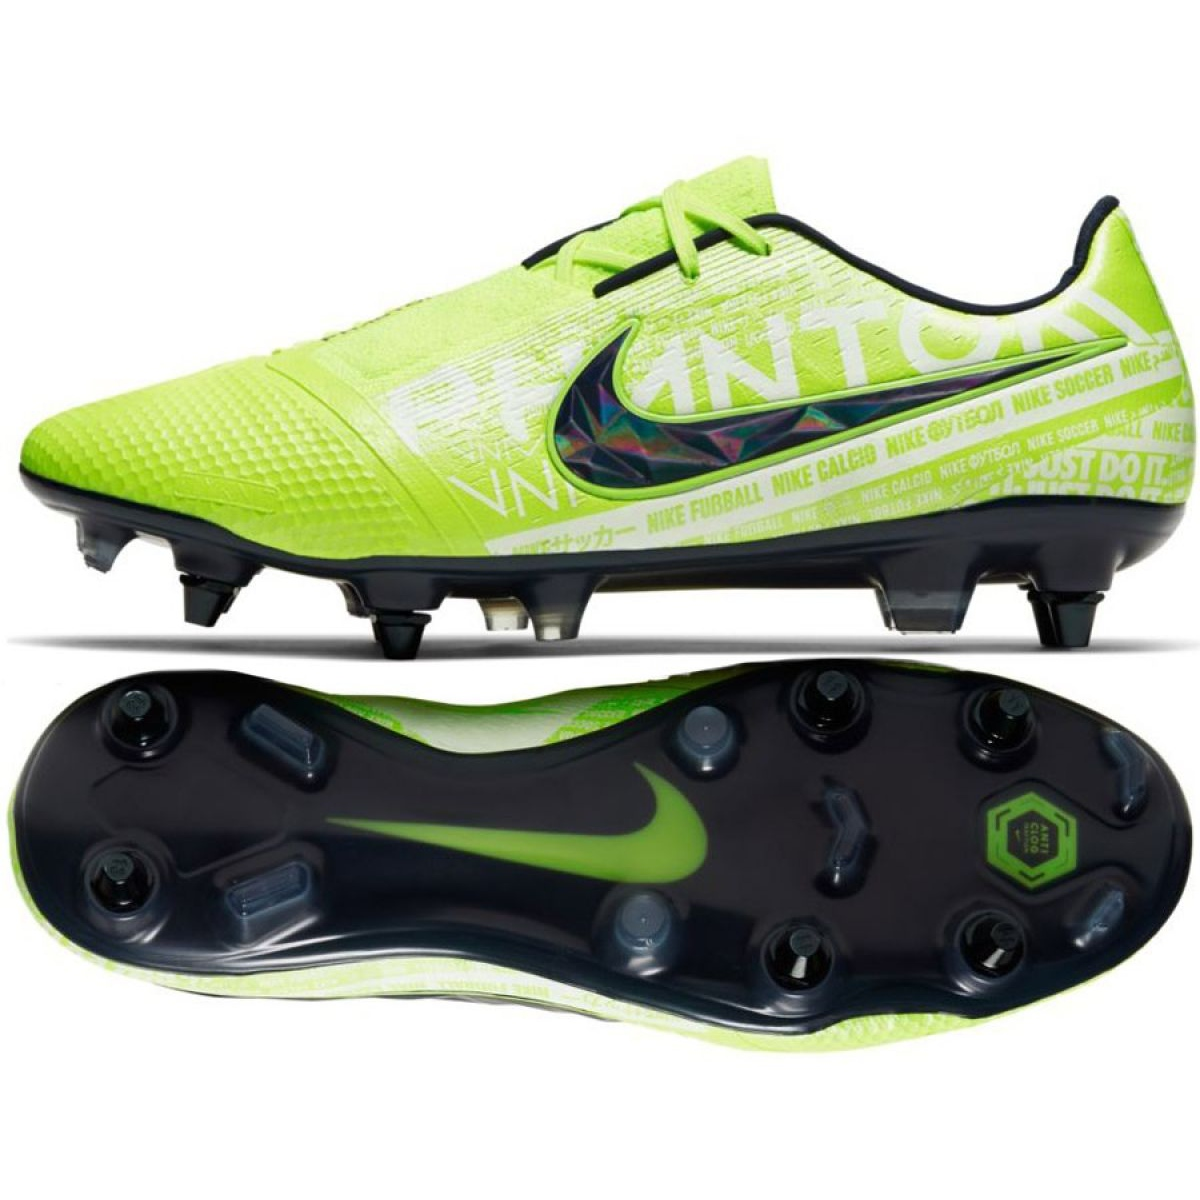 uk availability 698d5 b130c Nike Phantom Venom Elite Sg Pro Ac M AO0575-717 Football Boots